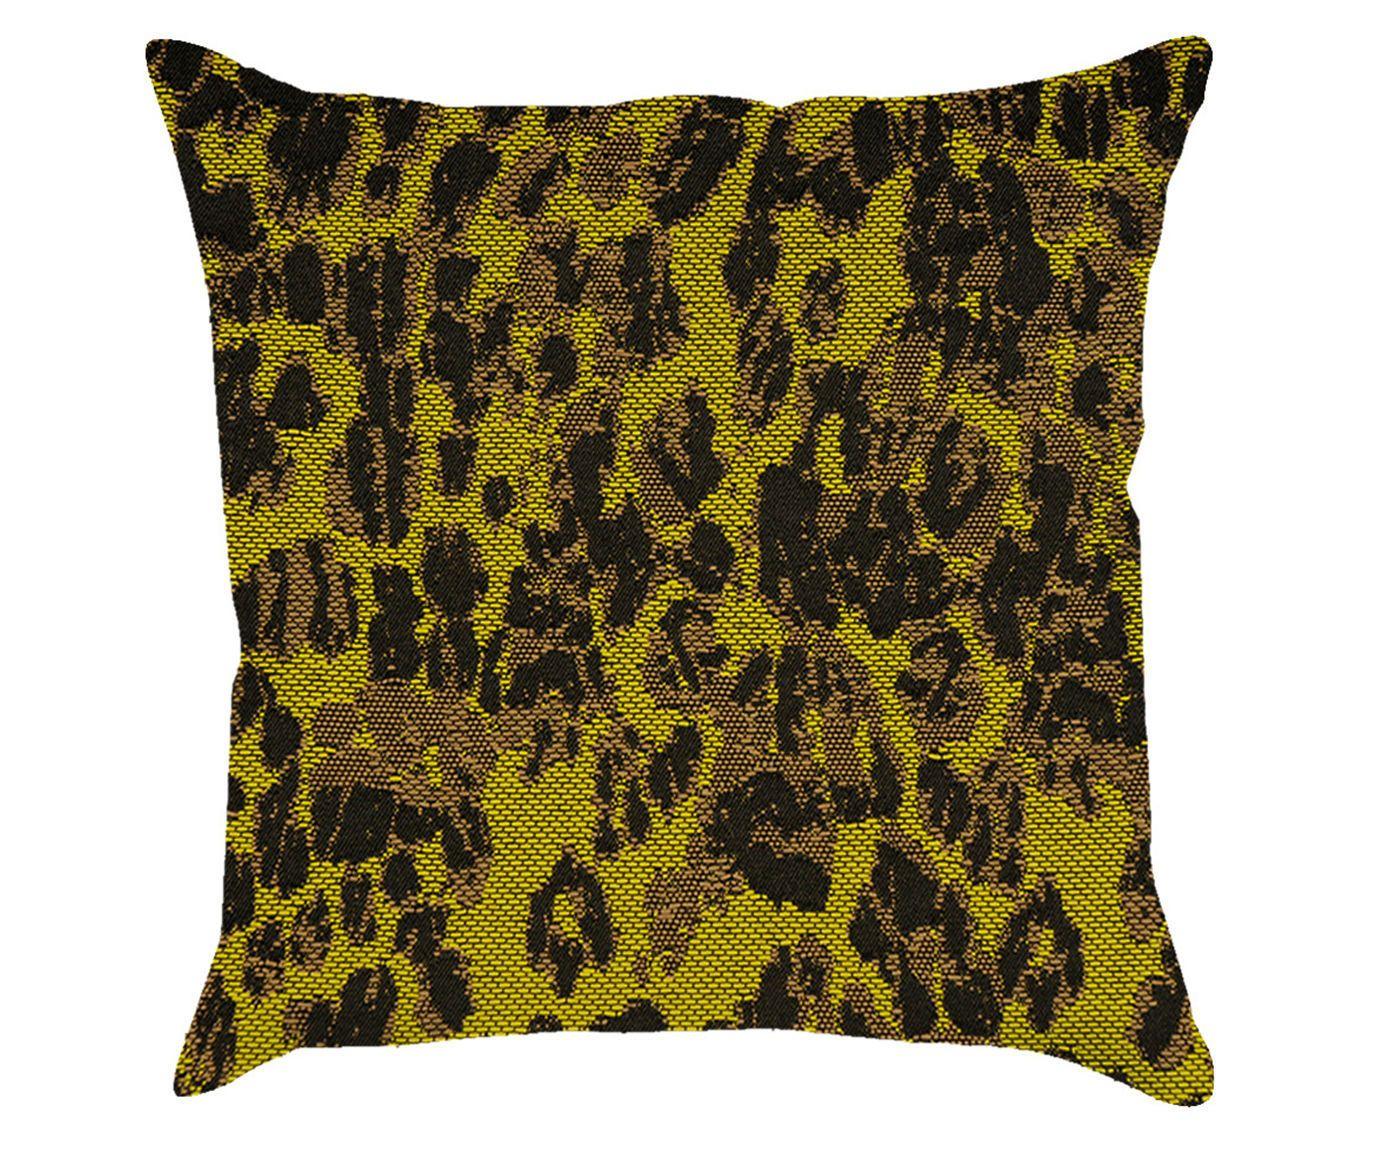 Capa para almofada selva soleil - 45x45cm | Westwing.com.br